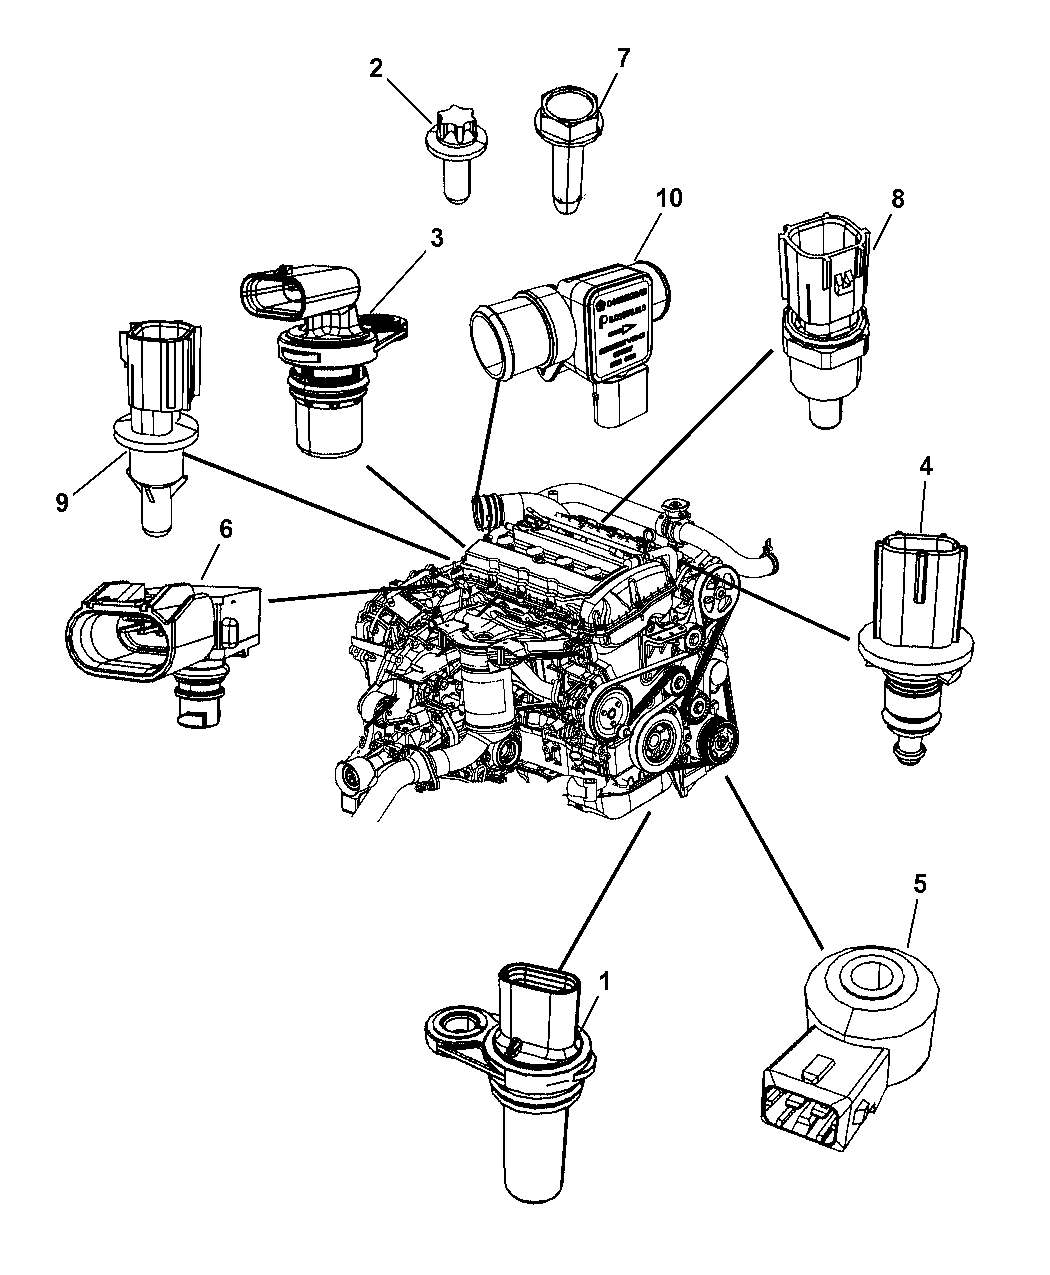 2009 dodge journey engine diagram wiring library rh 98 aboutinnocent org